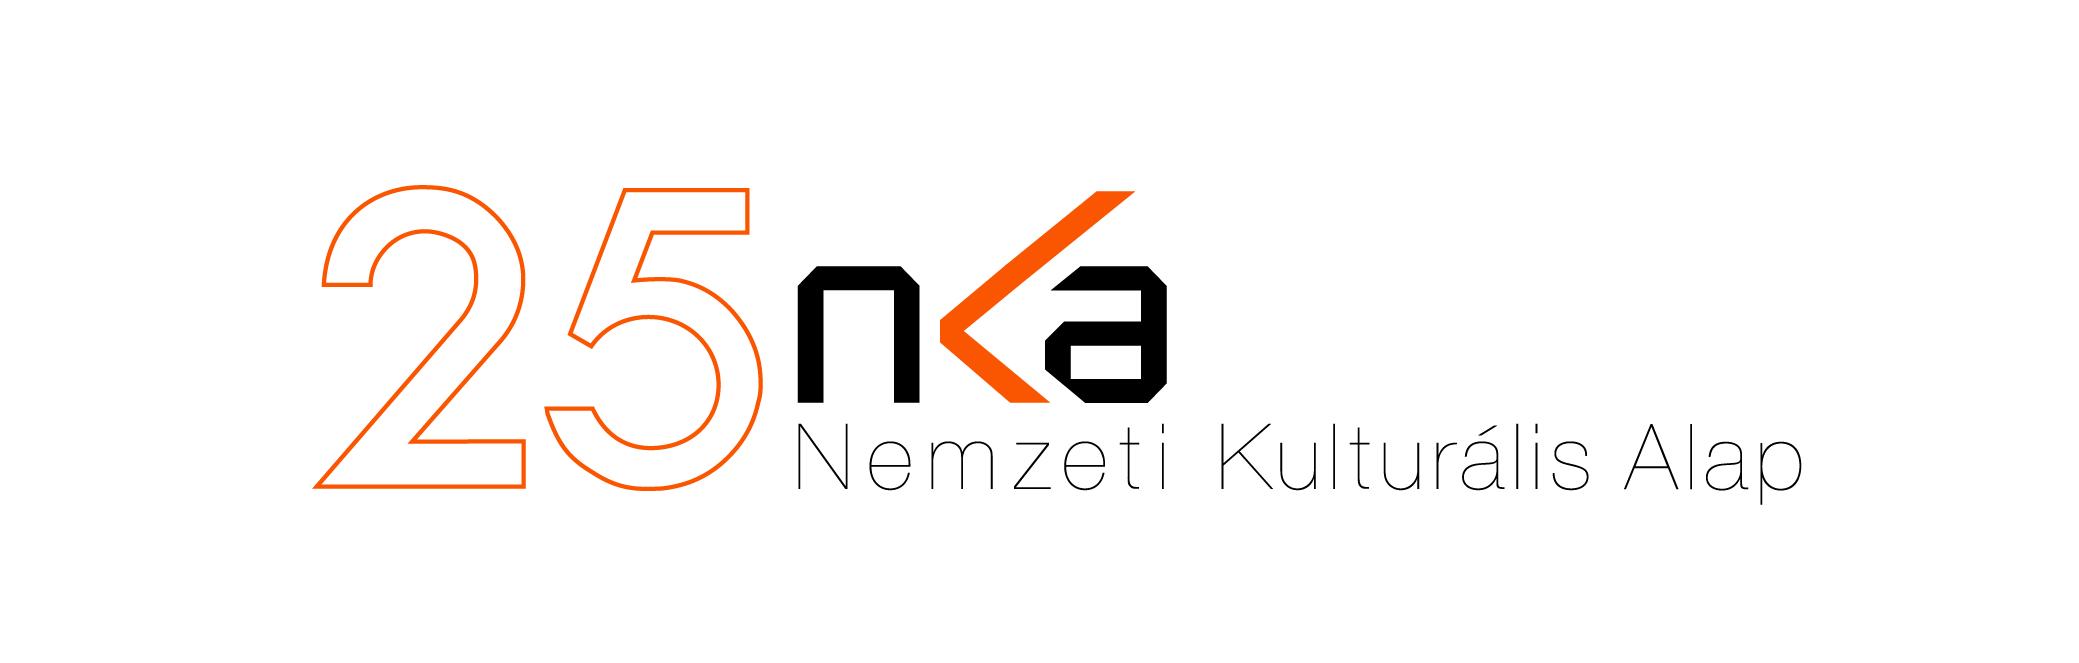 NKA_25_eves_logo_szines_CMYK